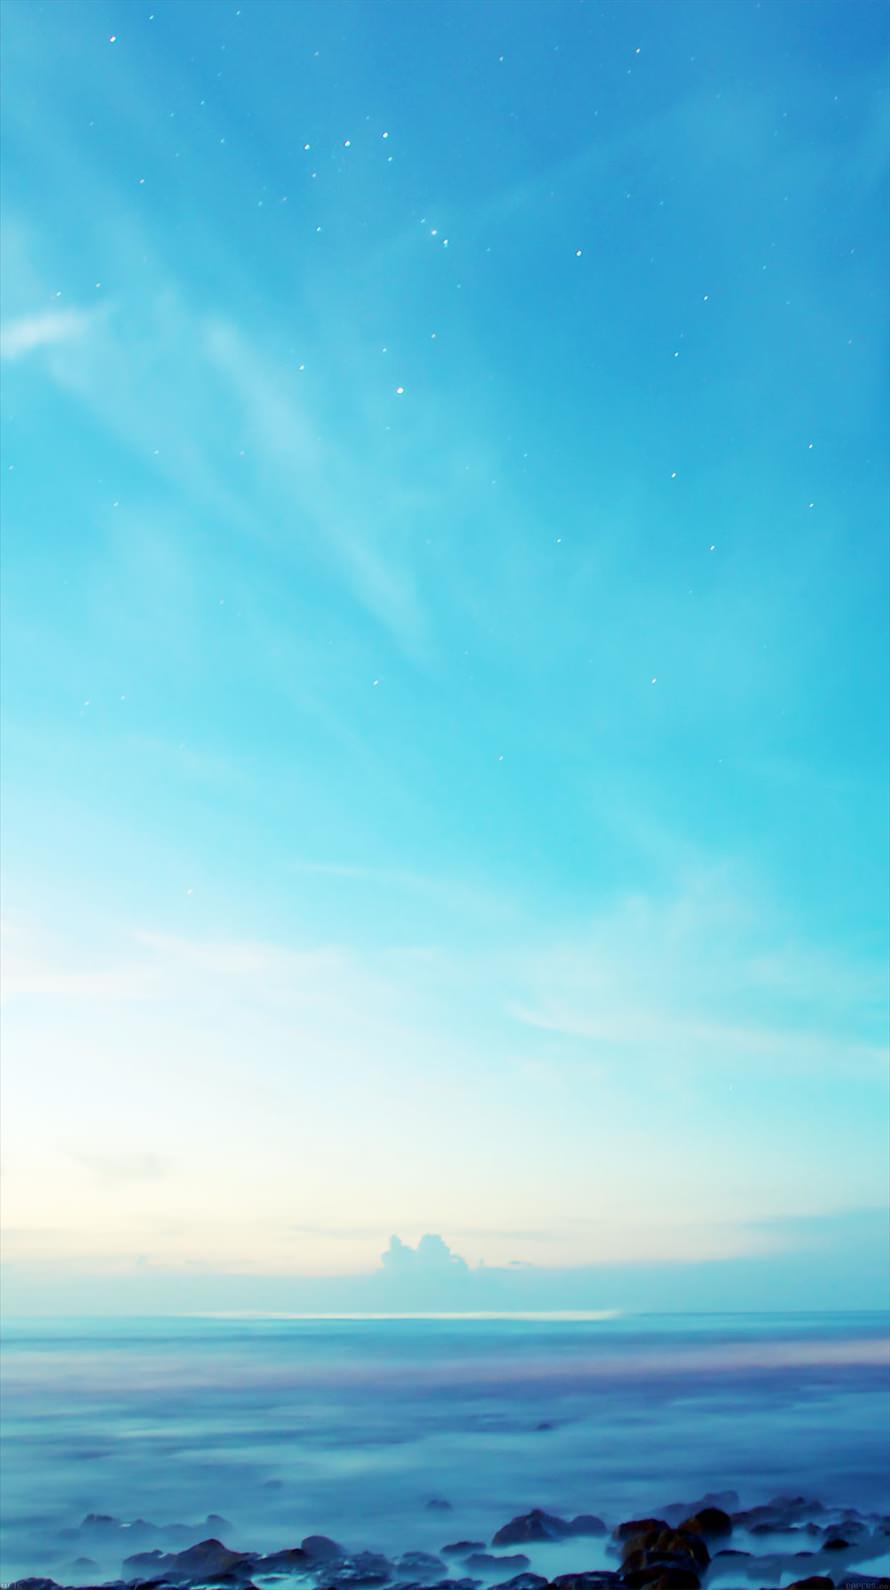 Cold Blue Scene Iphone6壁紙 Wallpaperbox